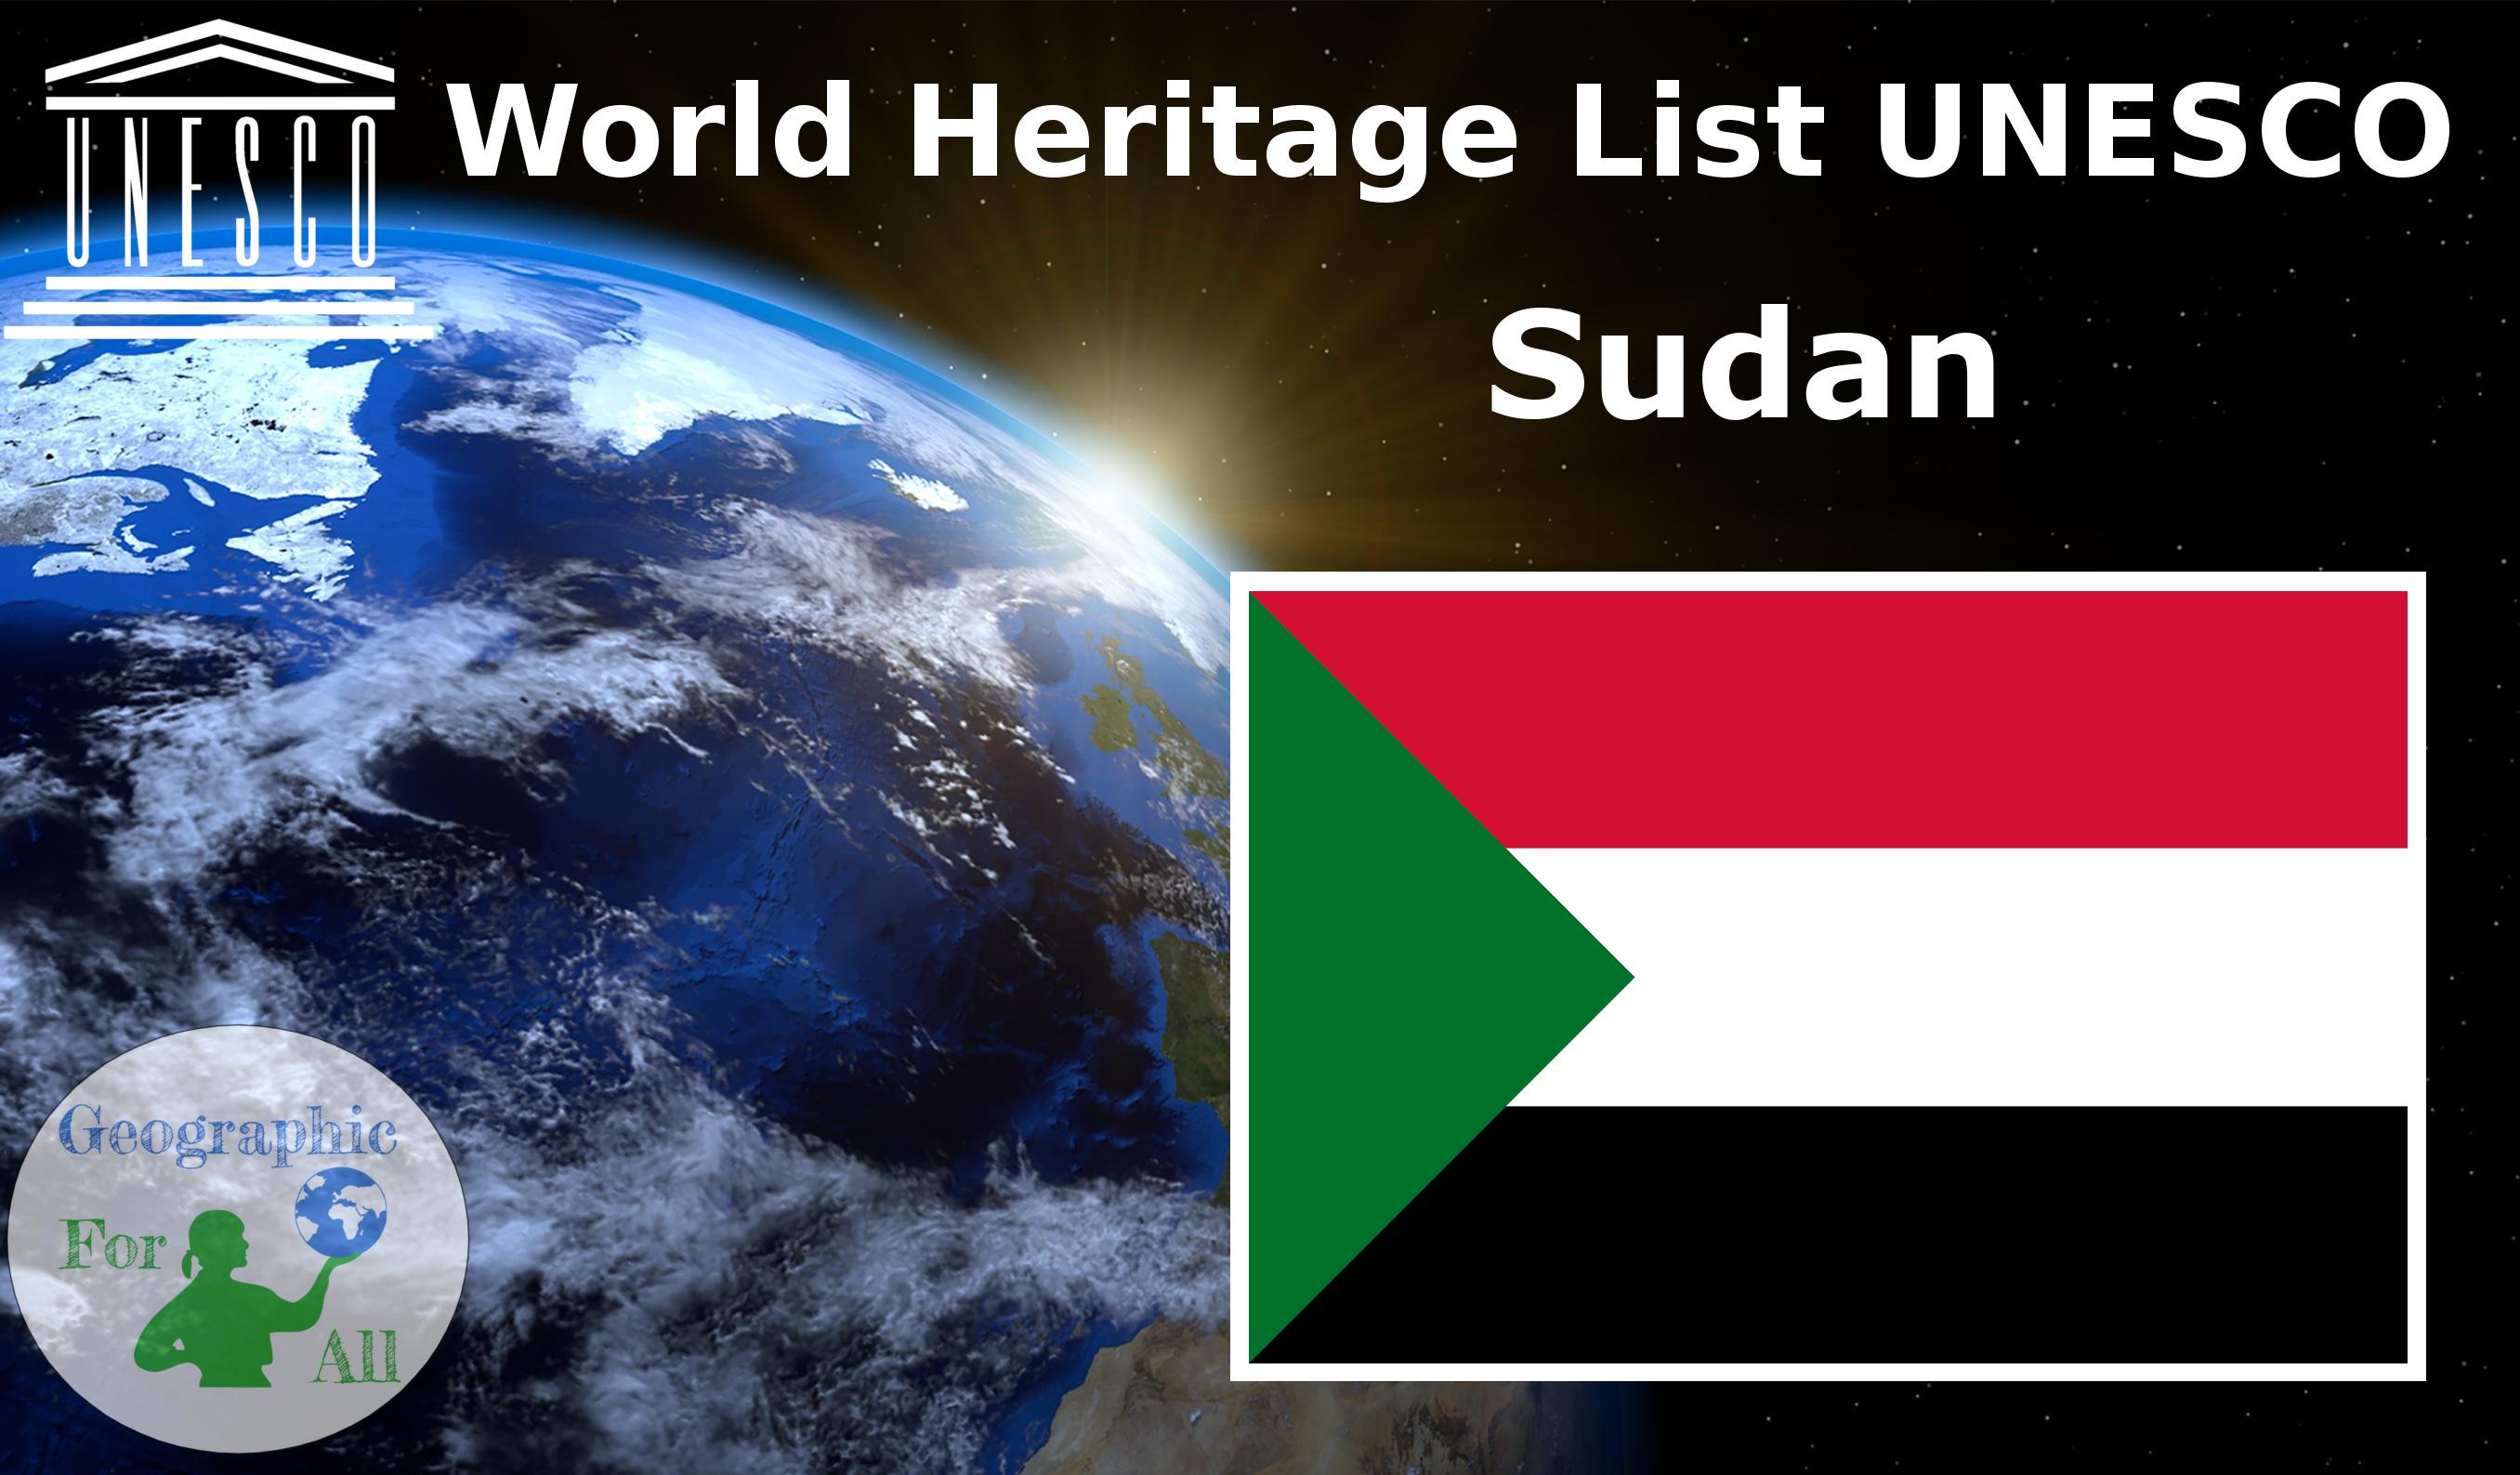 World Heritage List UNESCO - Sudan